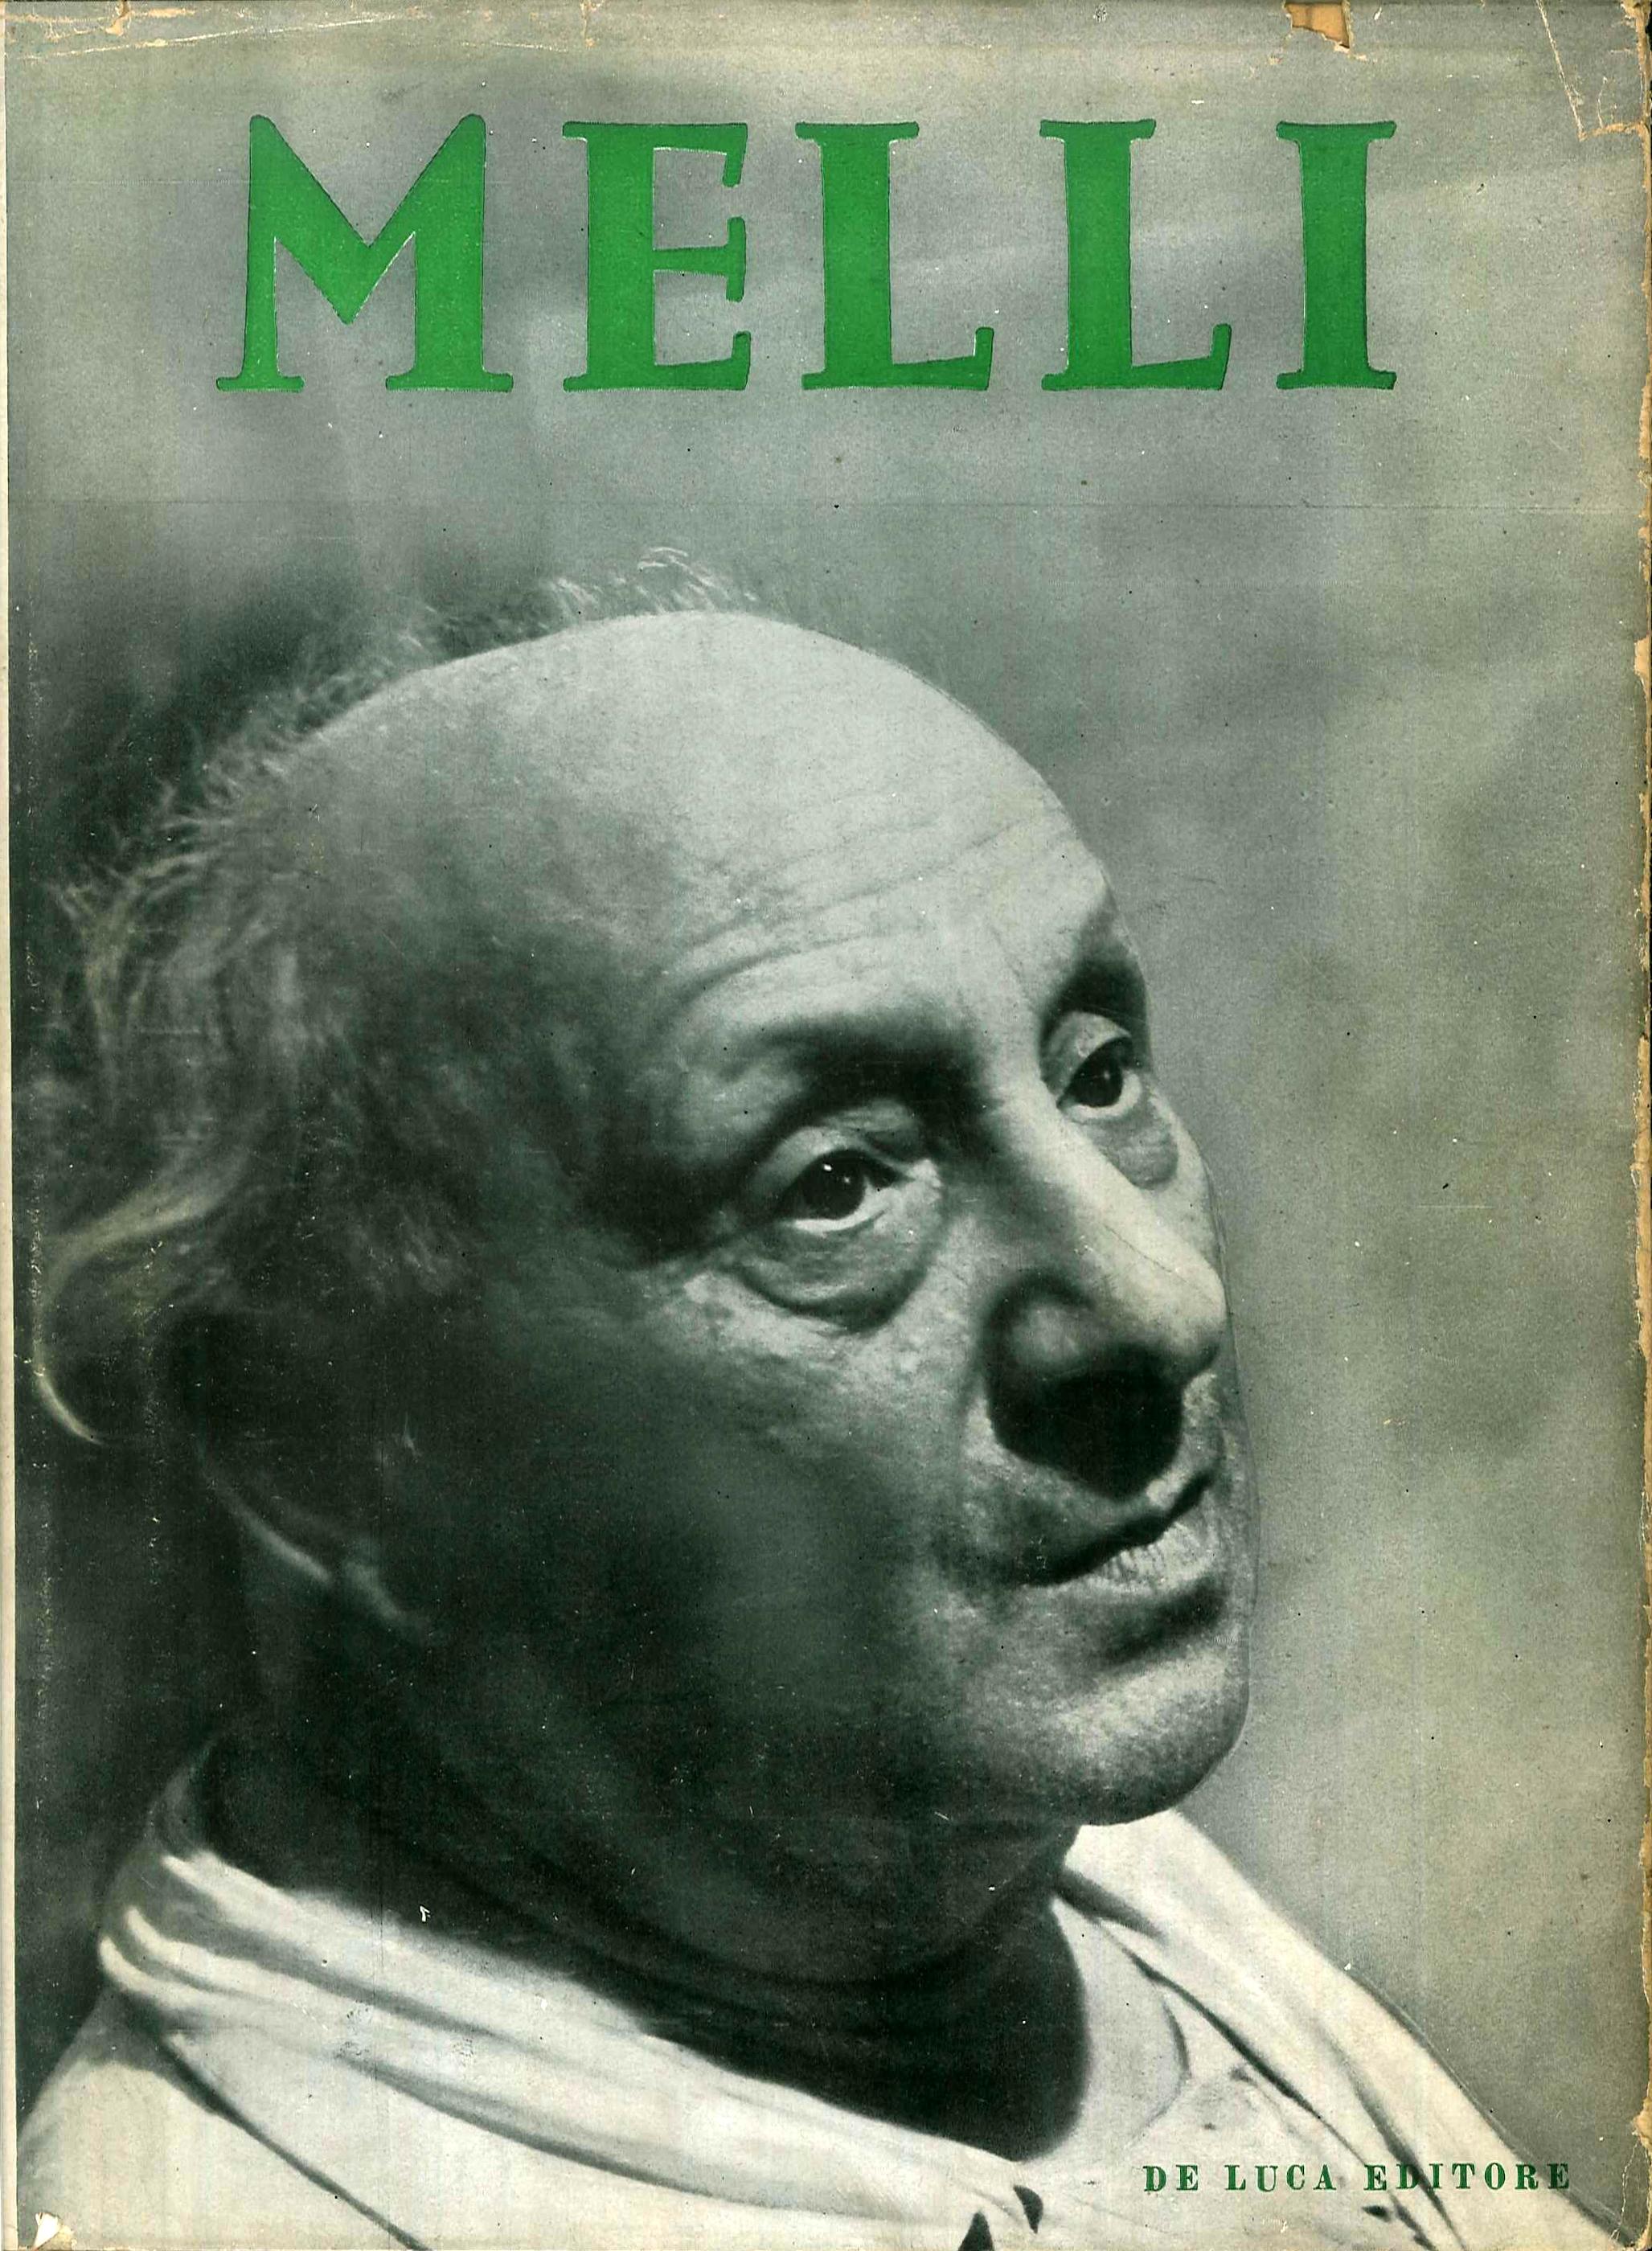 Roberto Melli.